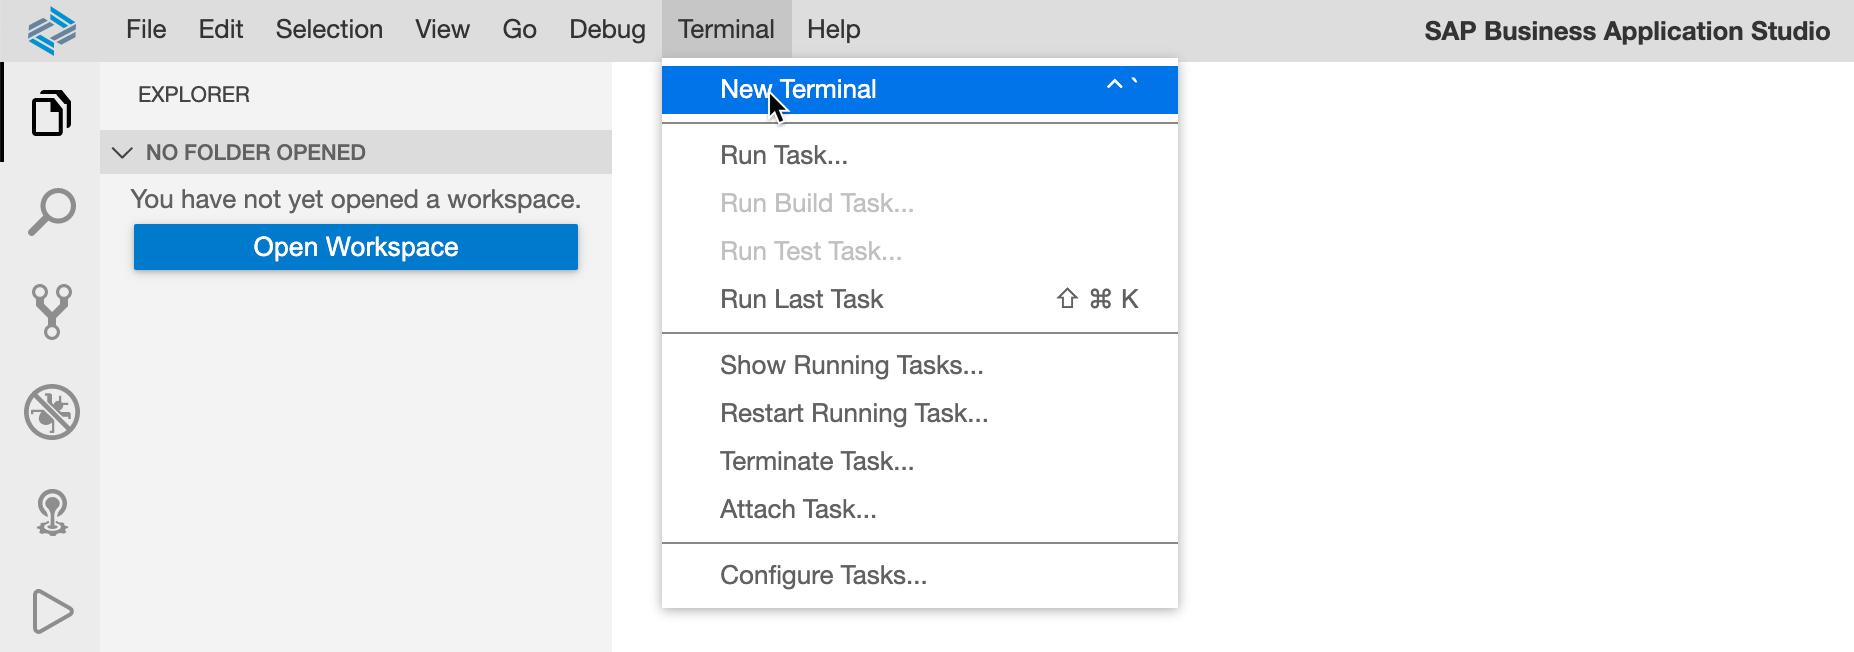 Create New Terminal